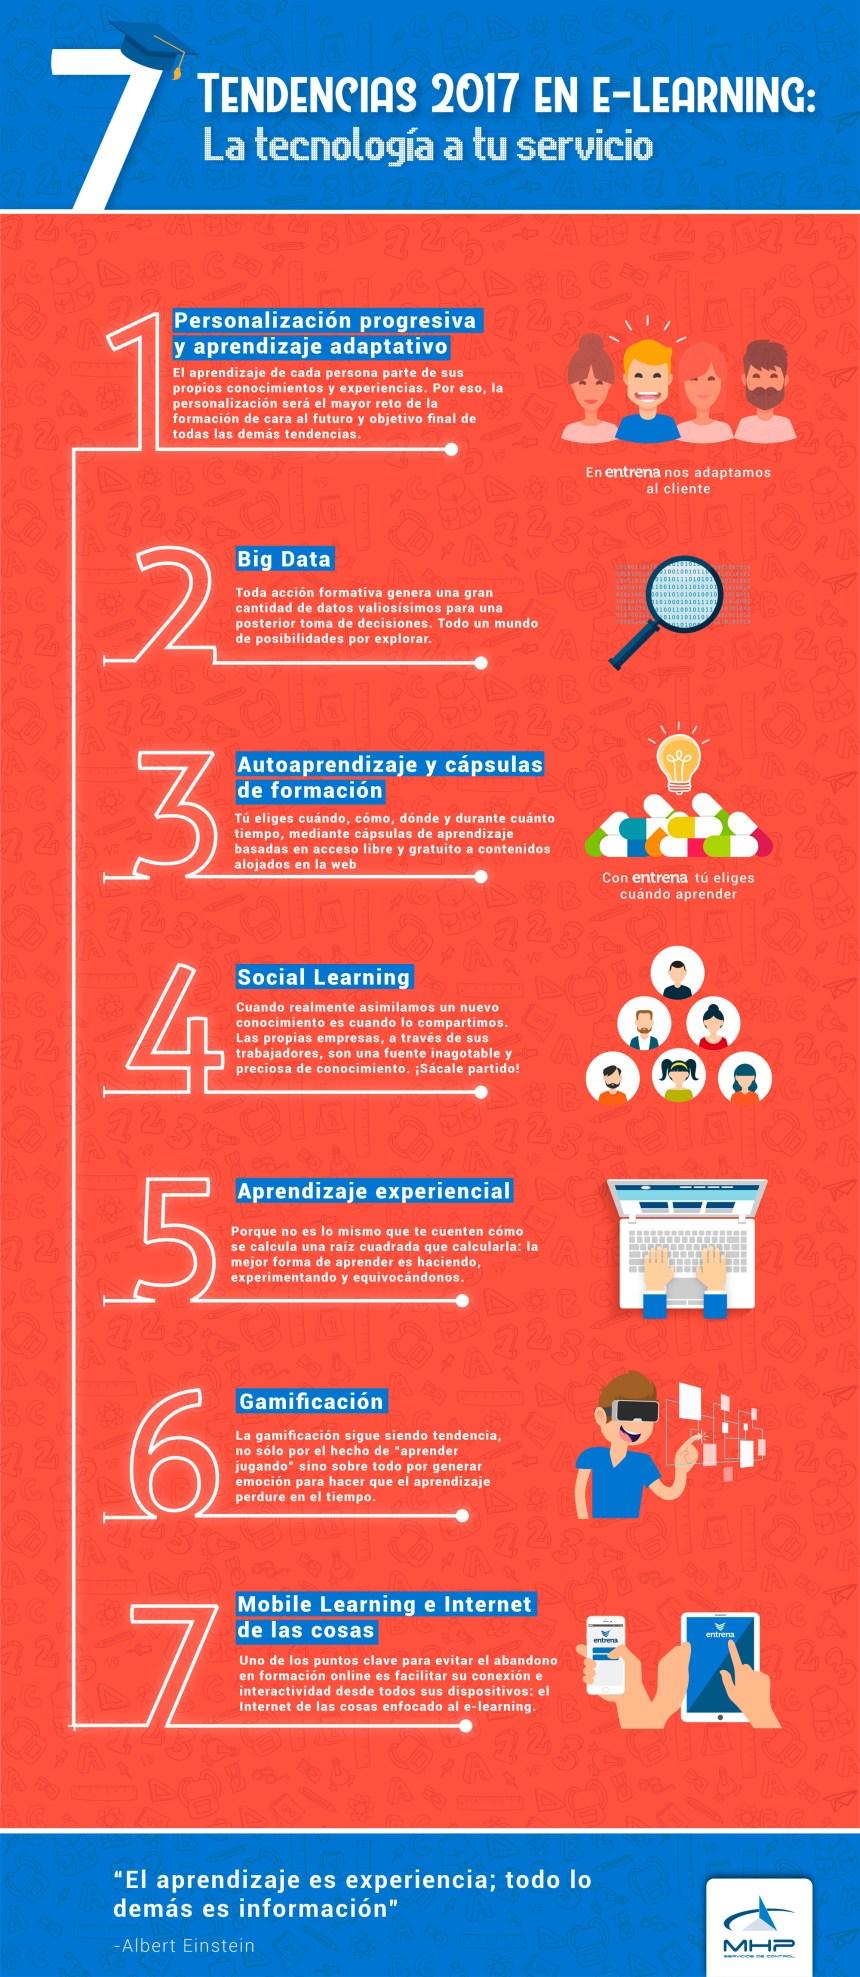 7 tendencias en eLearning